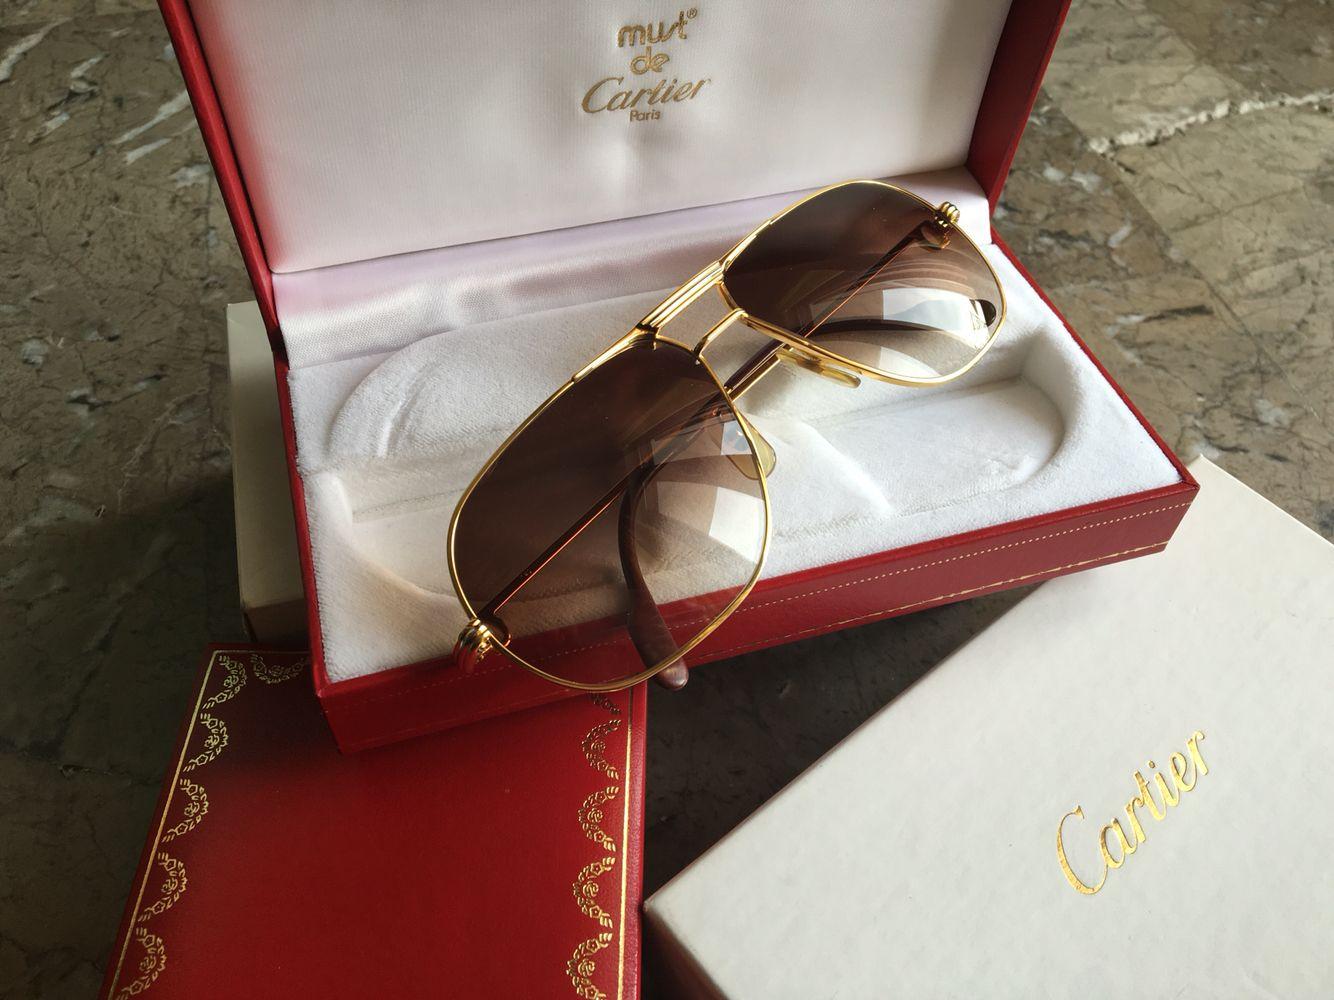 70270de408d Giverny Wood de Cartier occhiali bubinga Or - Abbigliamento e Accessori In  vendita a Caserta